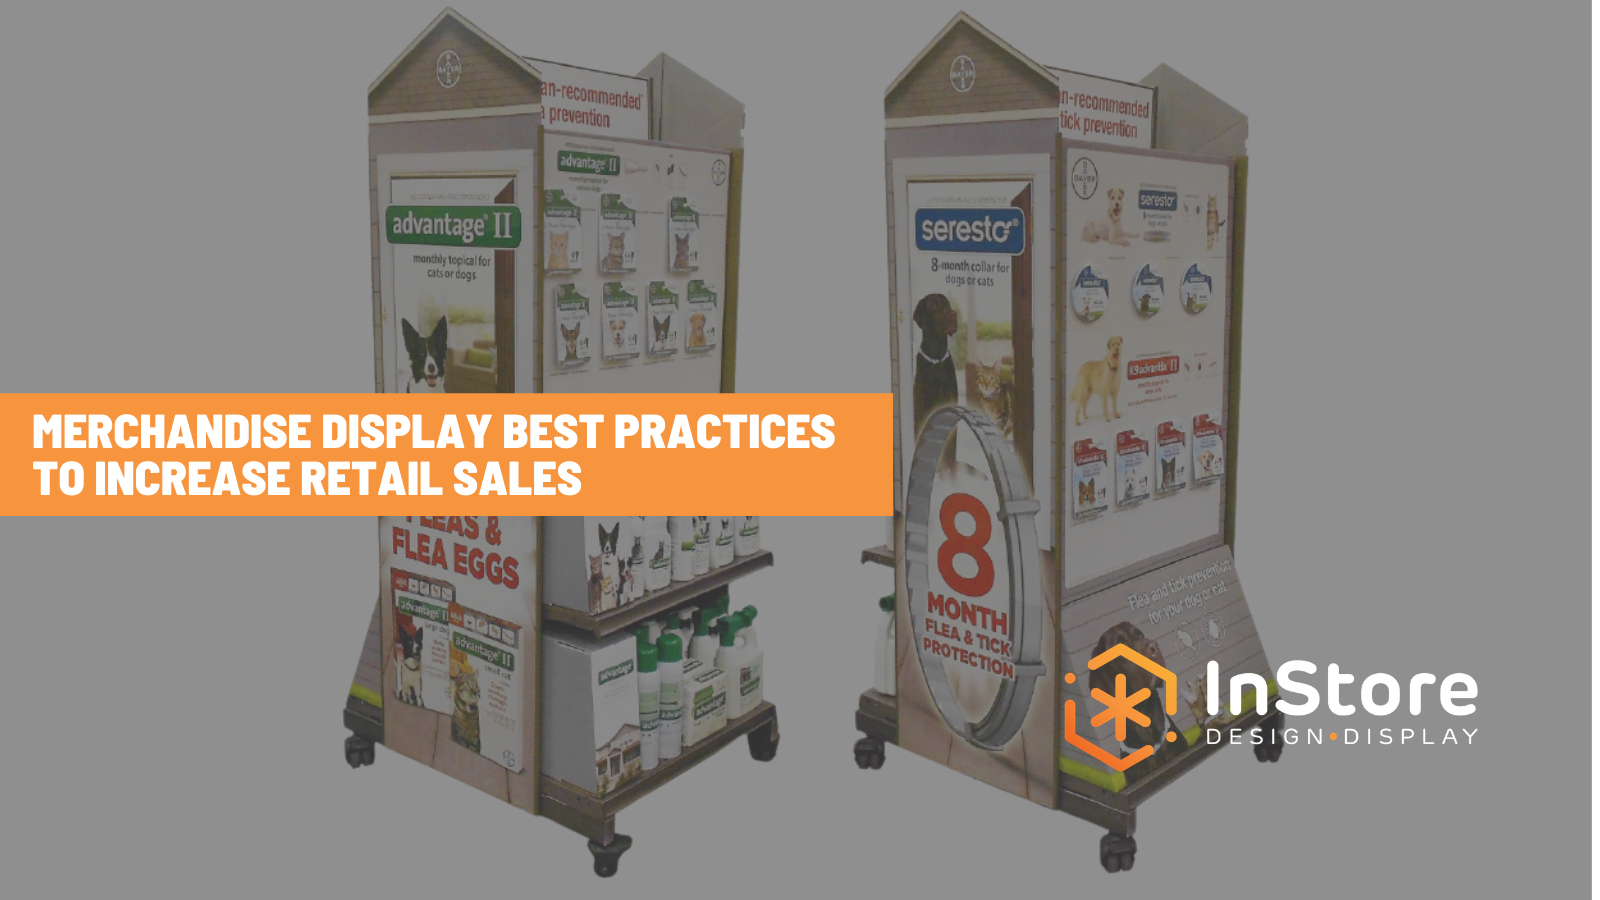 Merchandise Display Best Practices to Increase Retail Sales